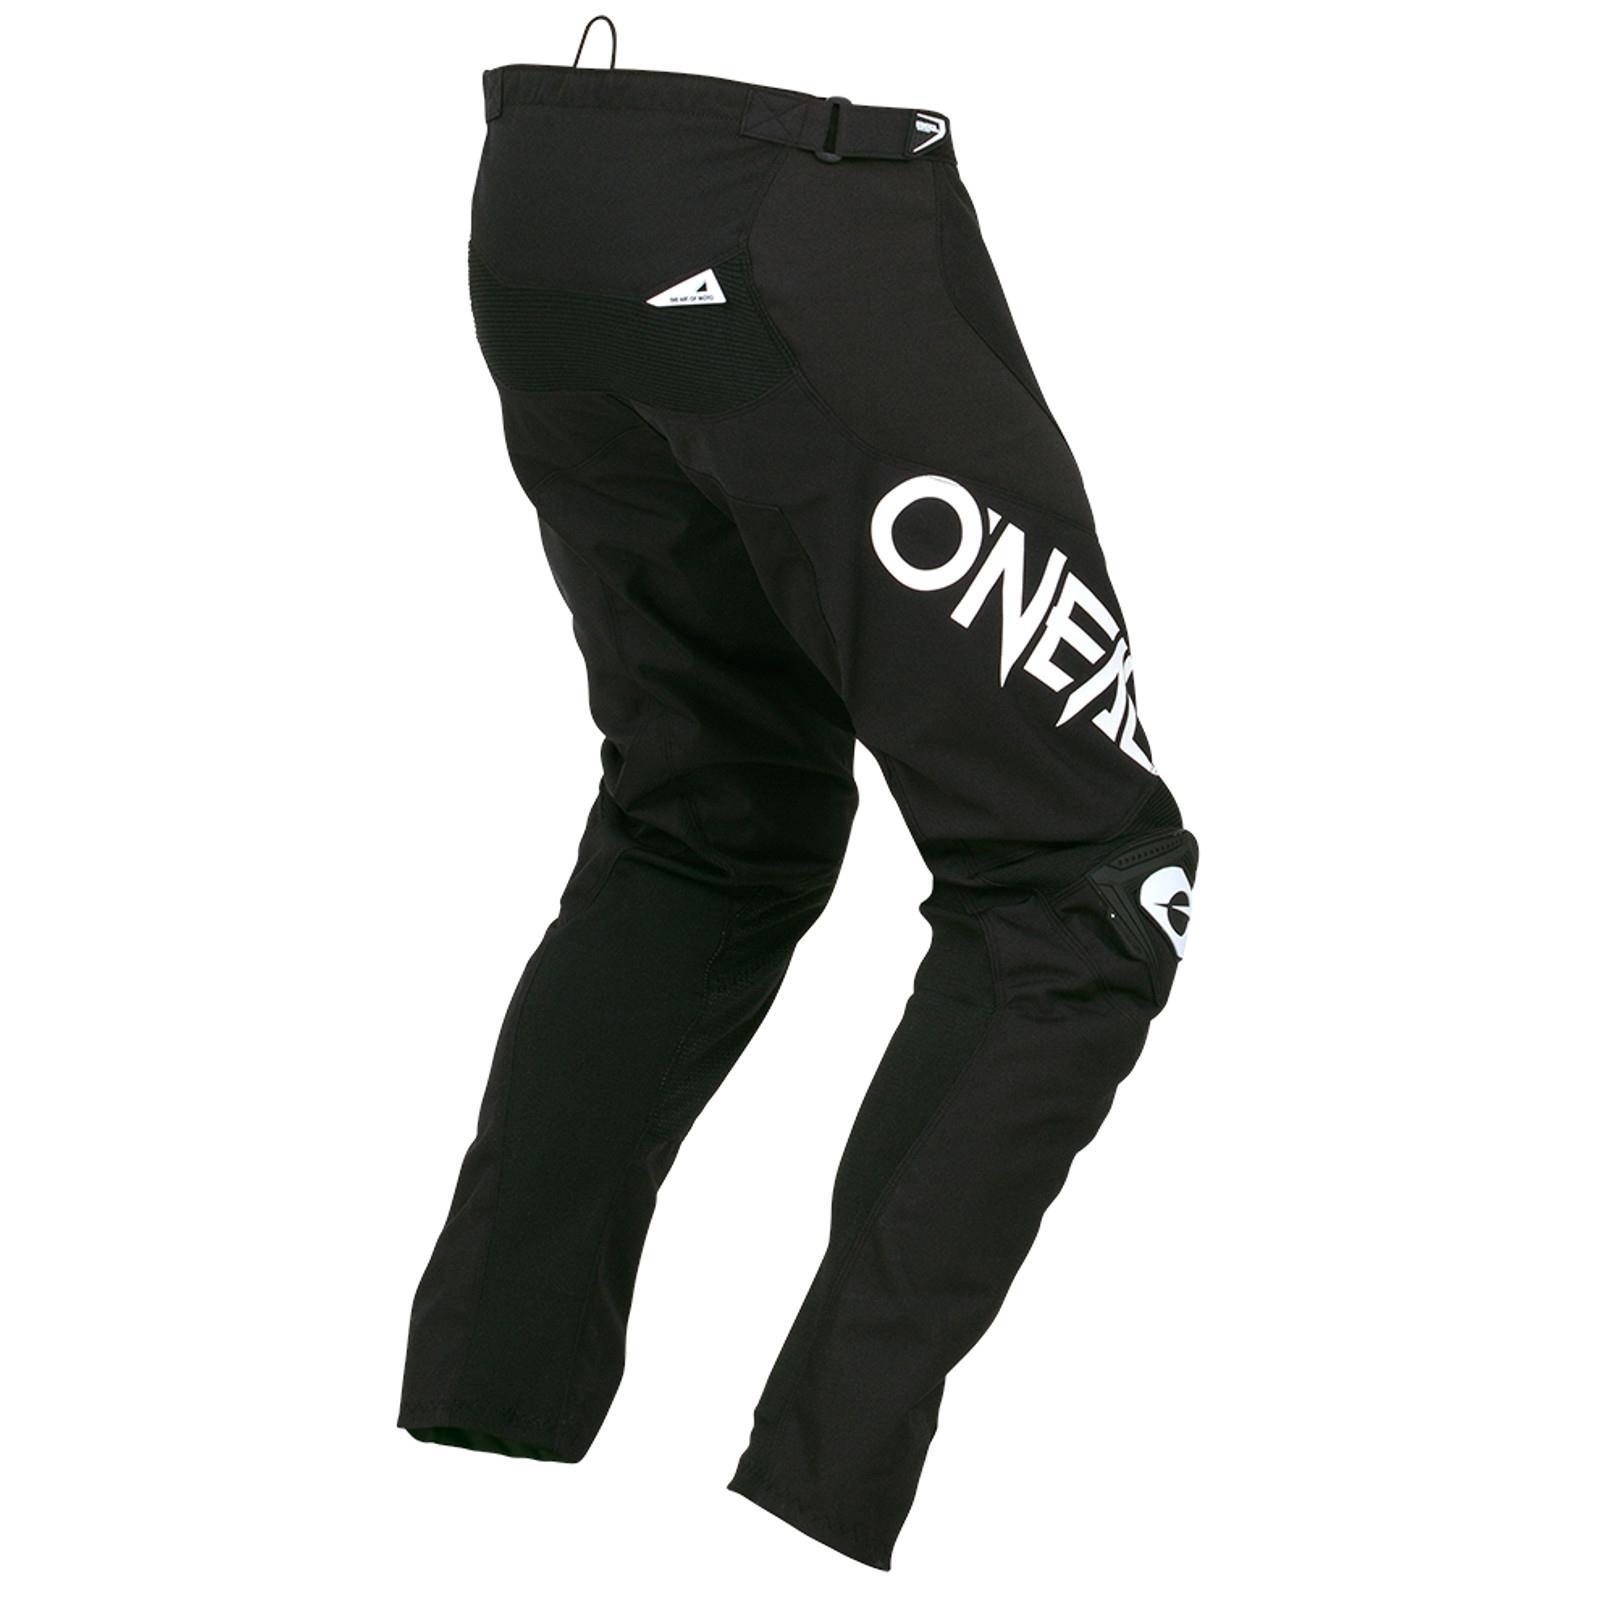 Oneal-elemento-Mayhem-Hardwear-Pants-pantalones-MX-DH-FR-Moto-Cross-Enduro-MTB-moto miniatura 59